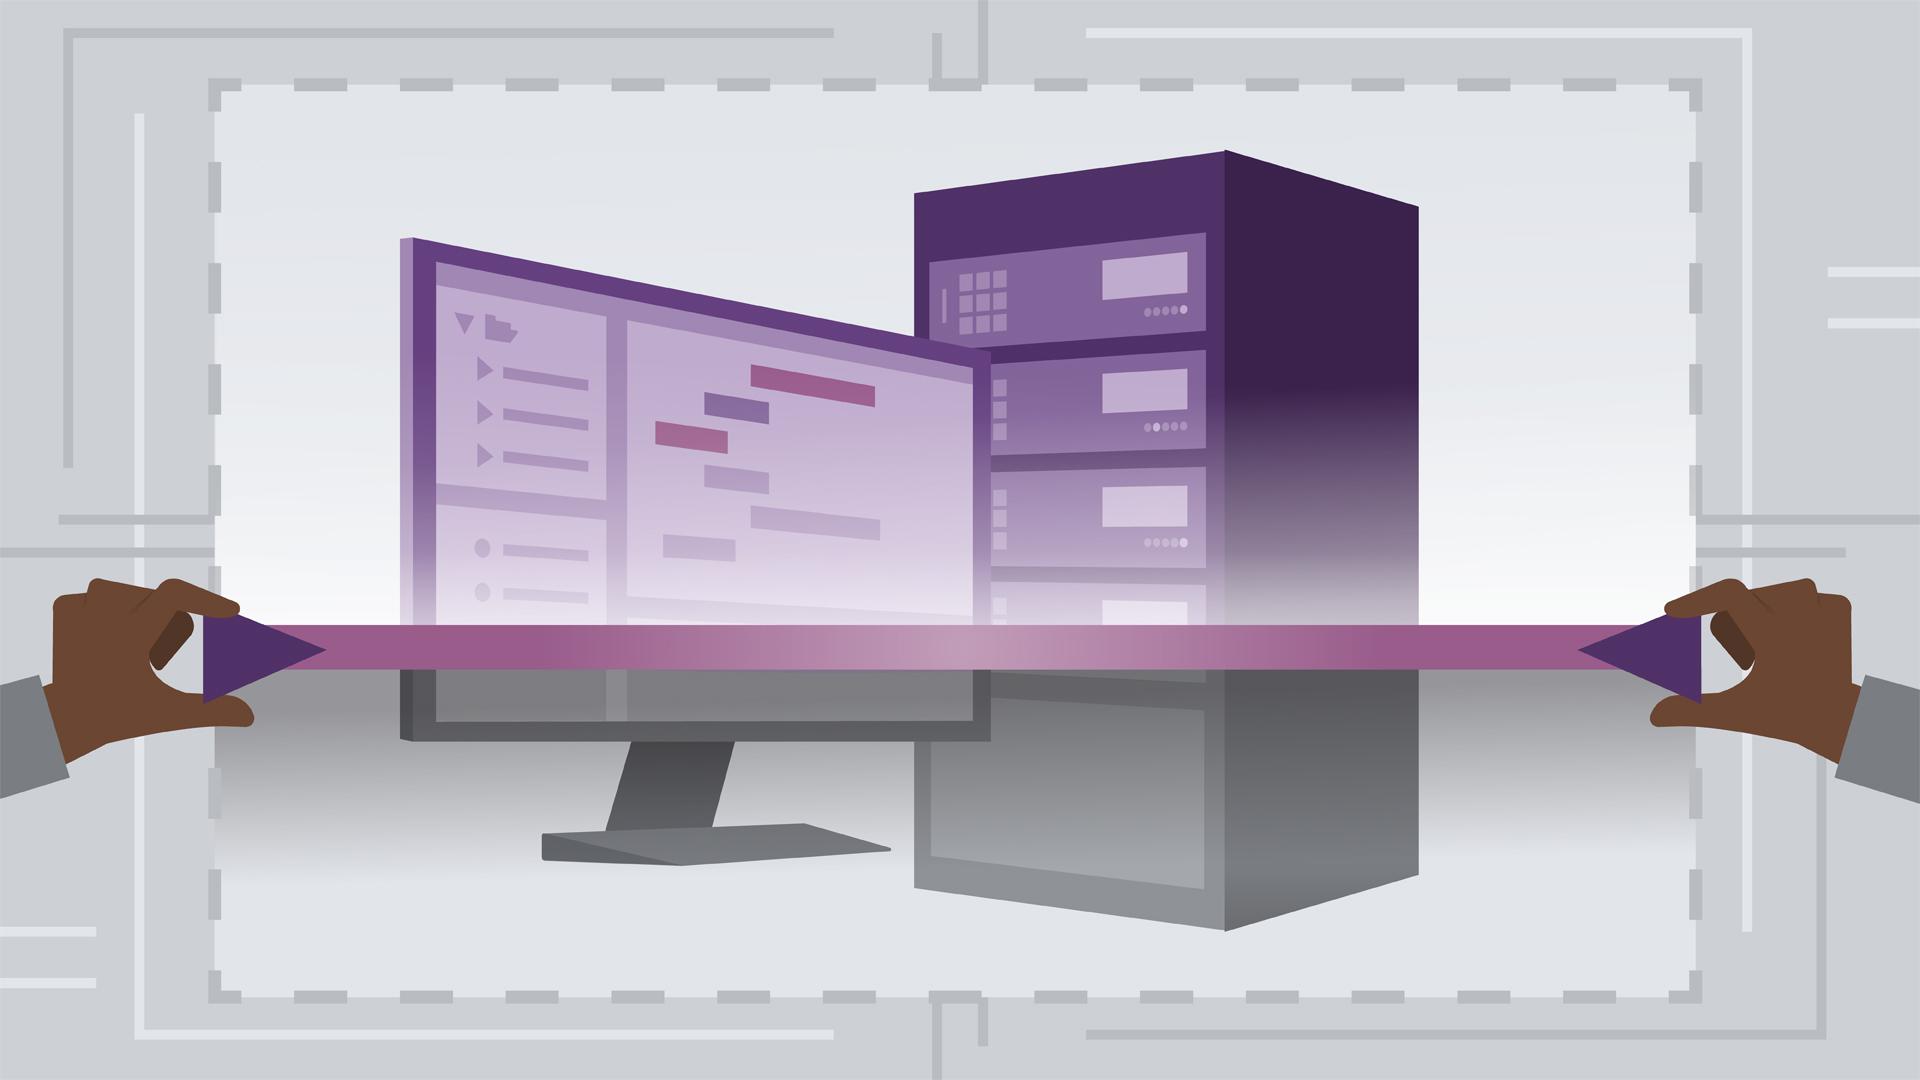 Managing vulnerabilities with Nessus: Security Testing: Vulnerability Management with Nessus